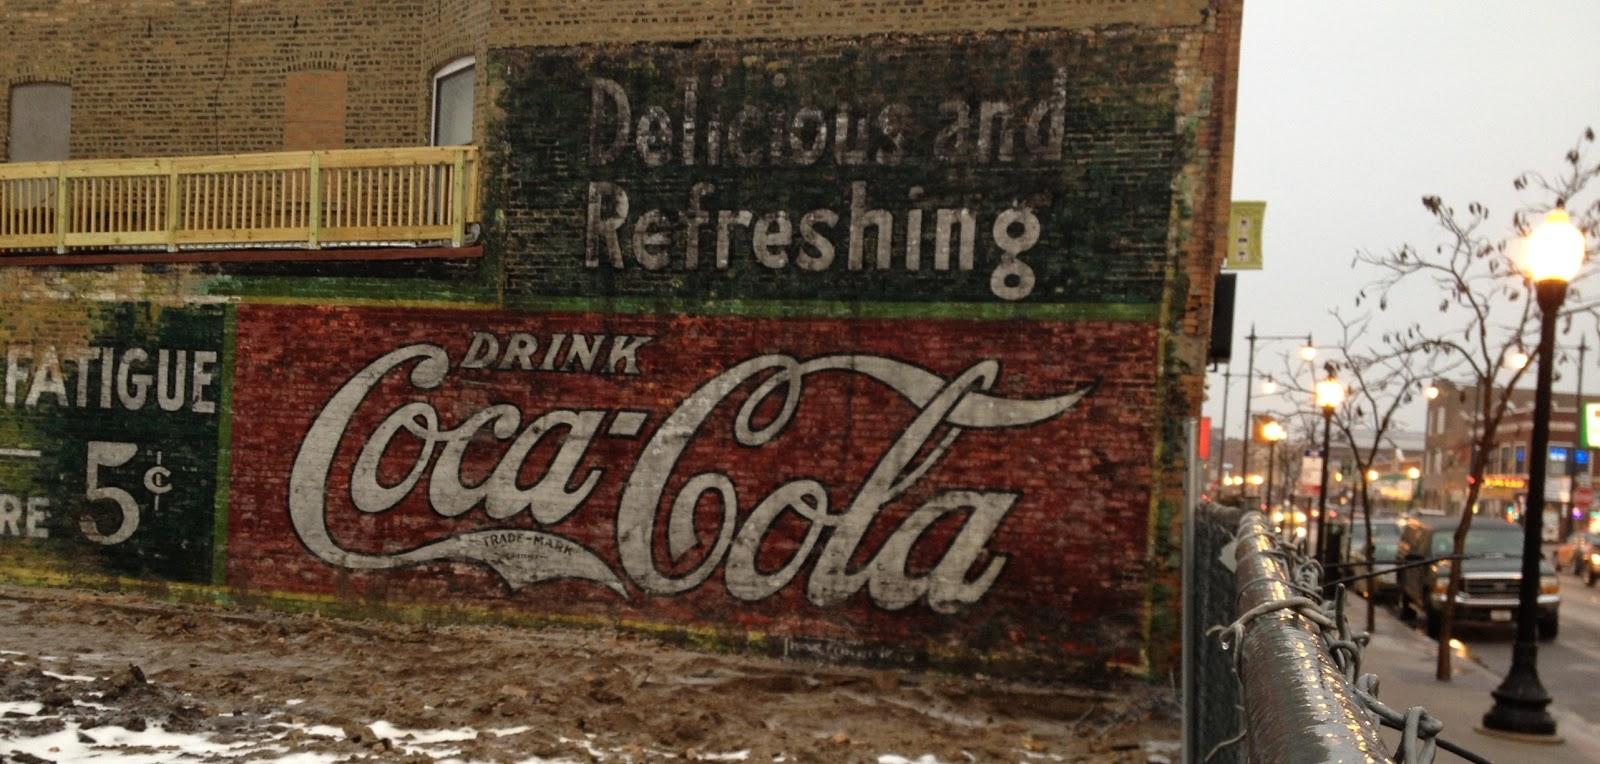 coca_cola_old_ad